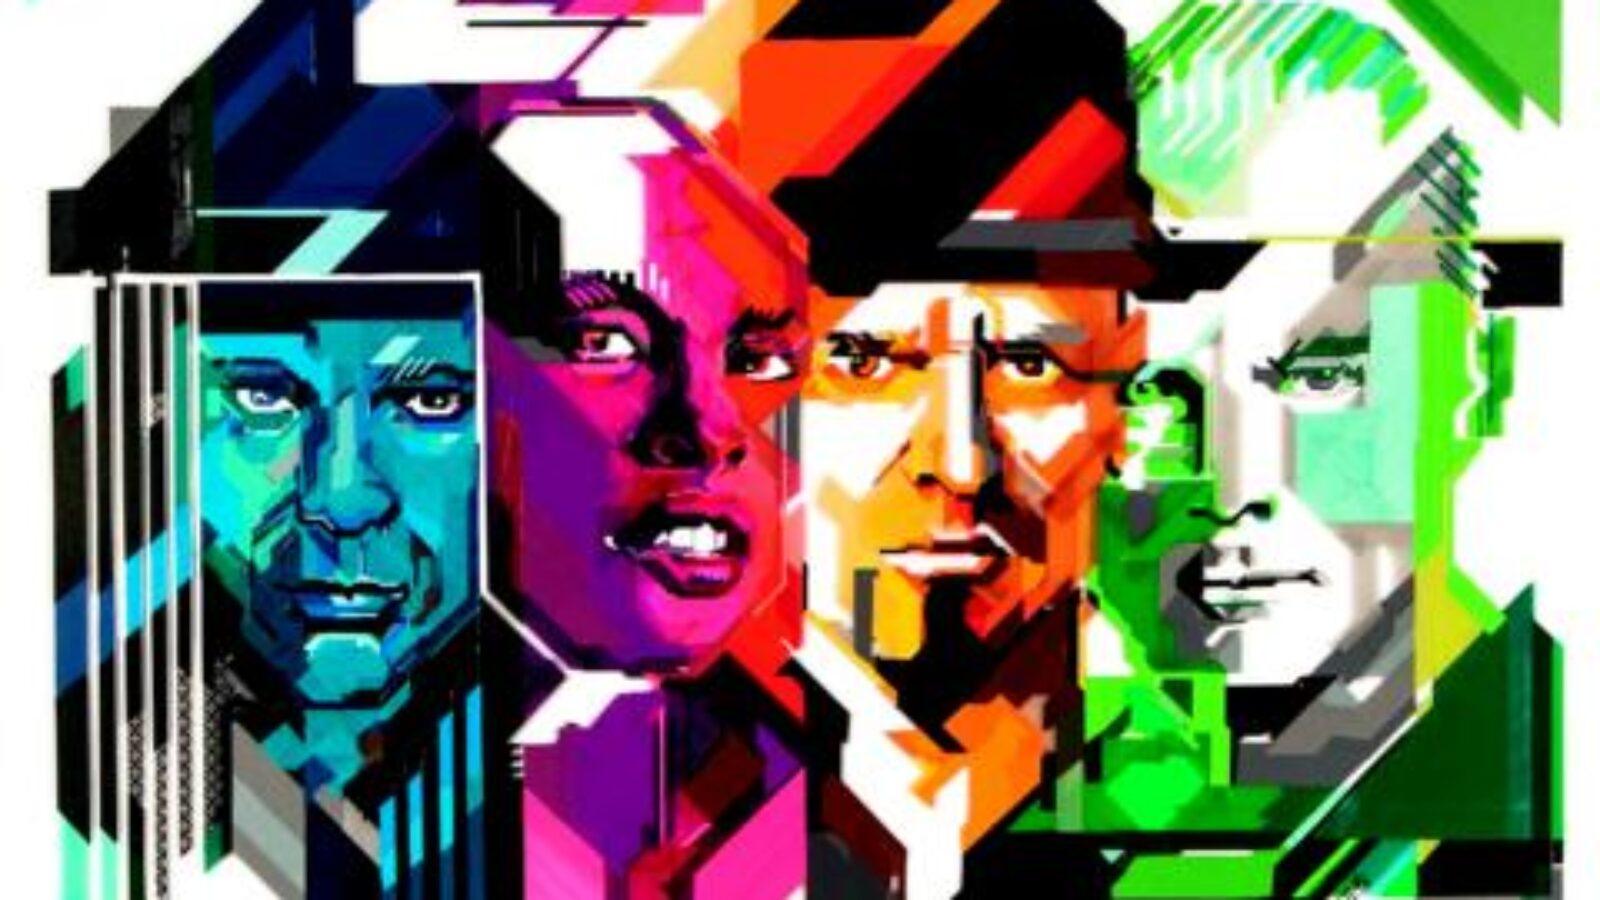 OXMOX CD-Tipps: SKUNK ANANSIE, Anarchytecture